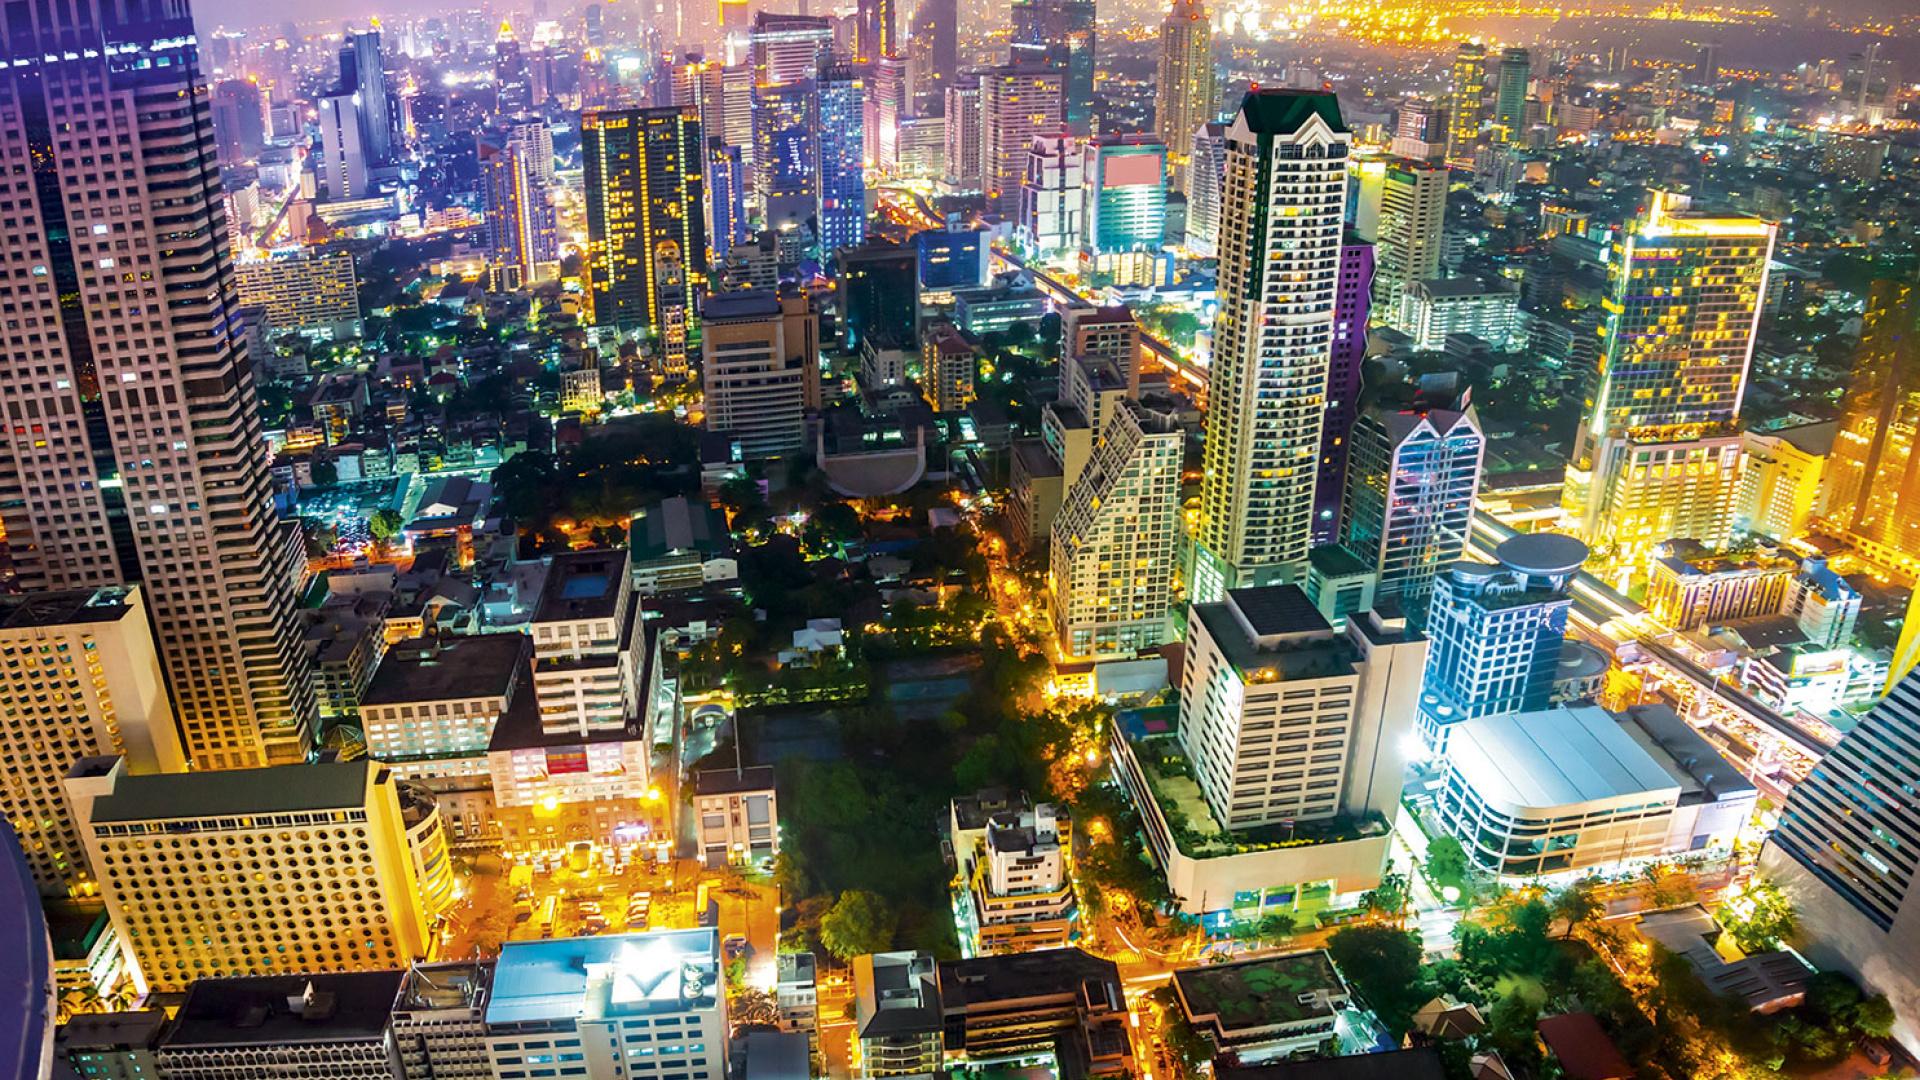 Bangkok at night. Photograph from Shutterstock